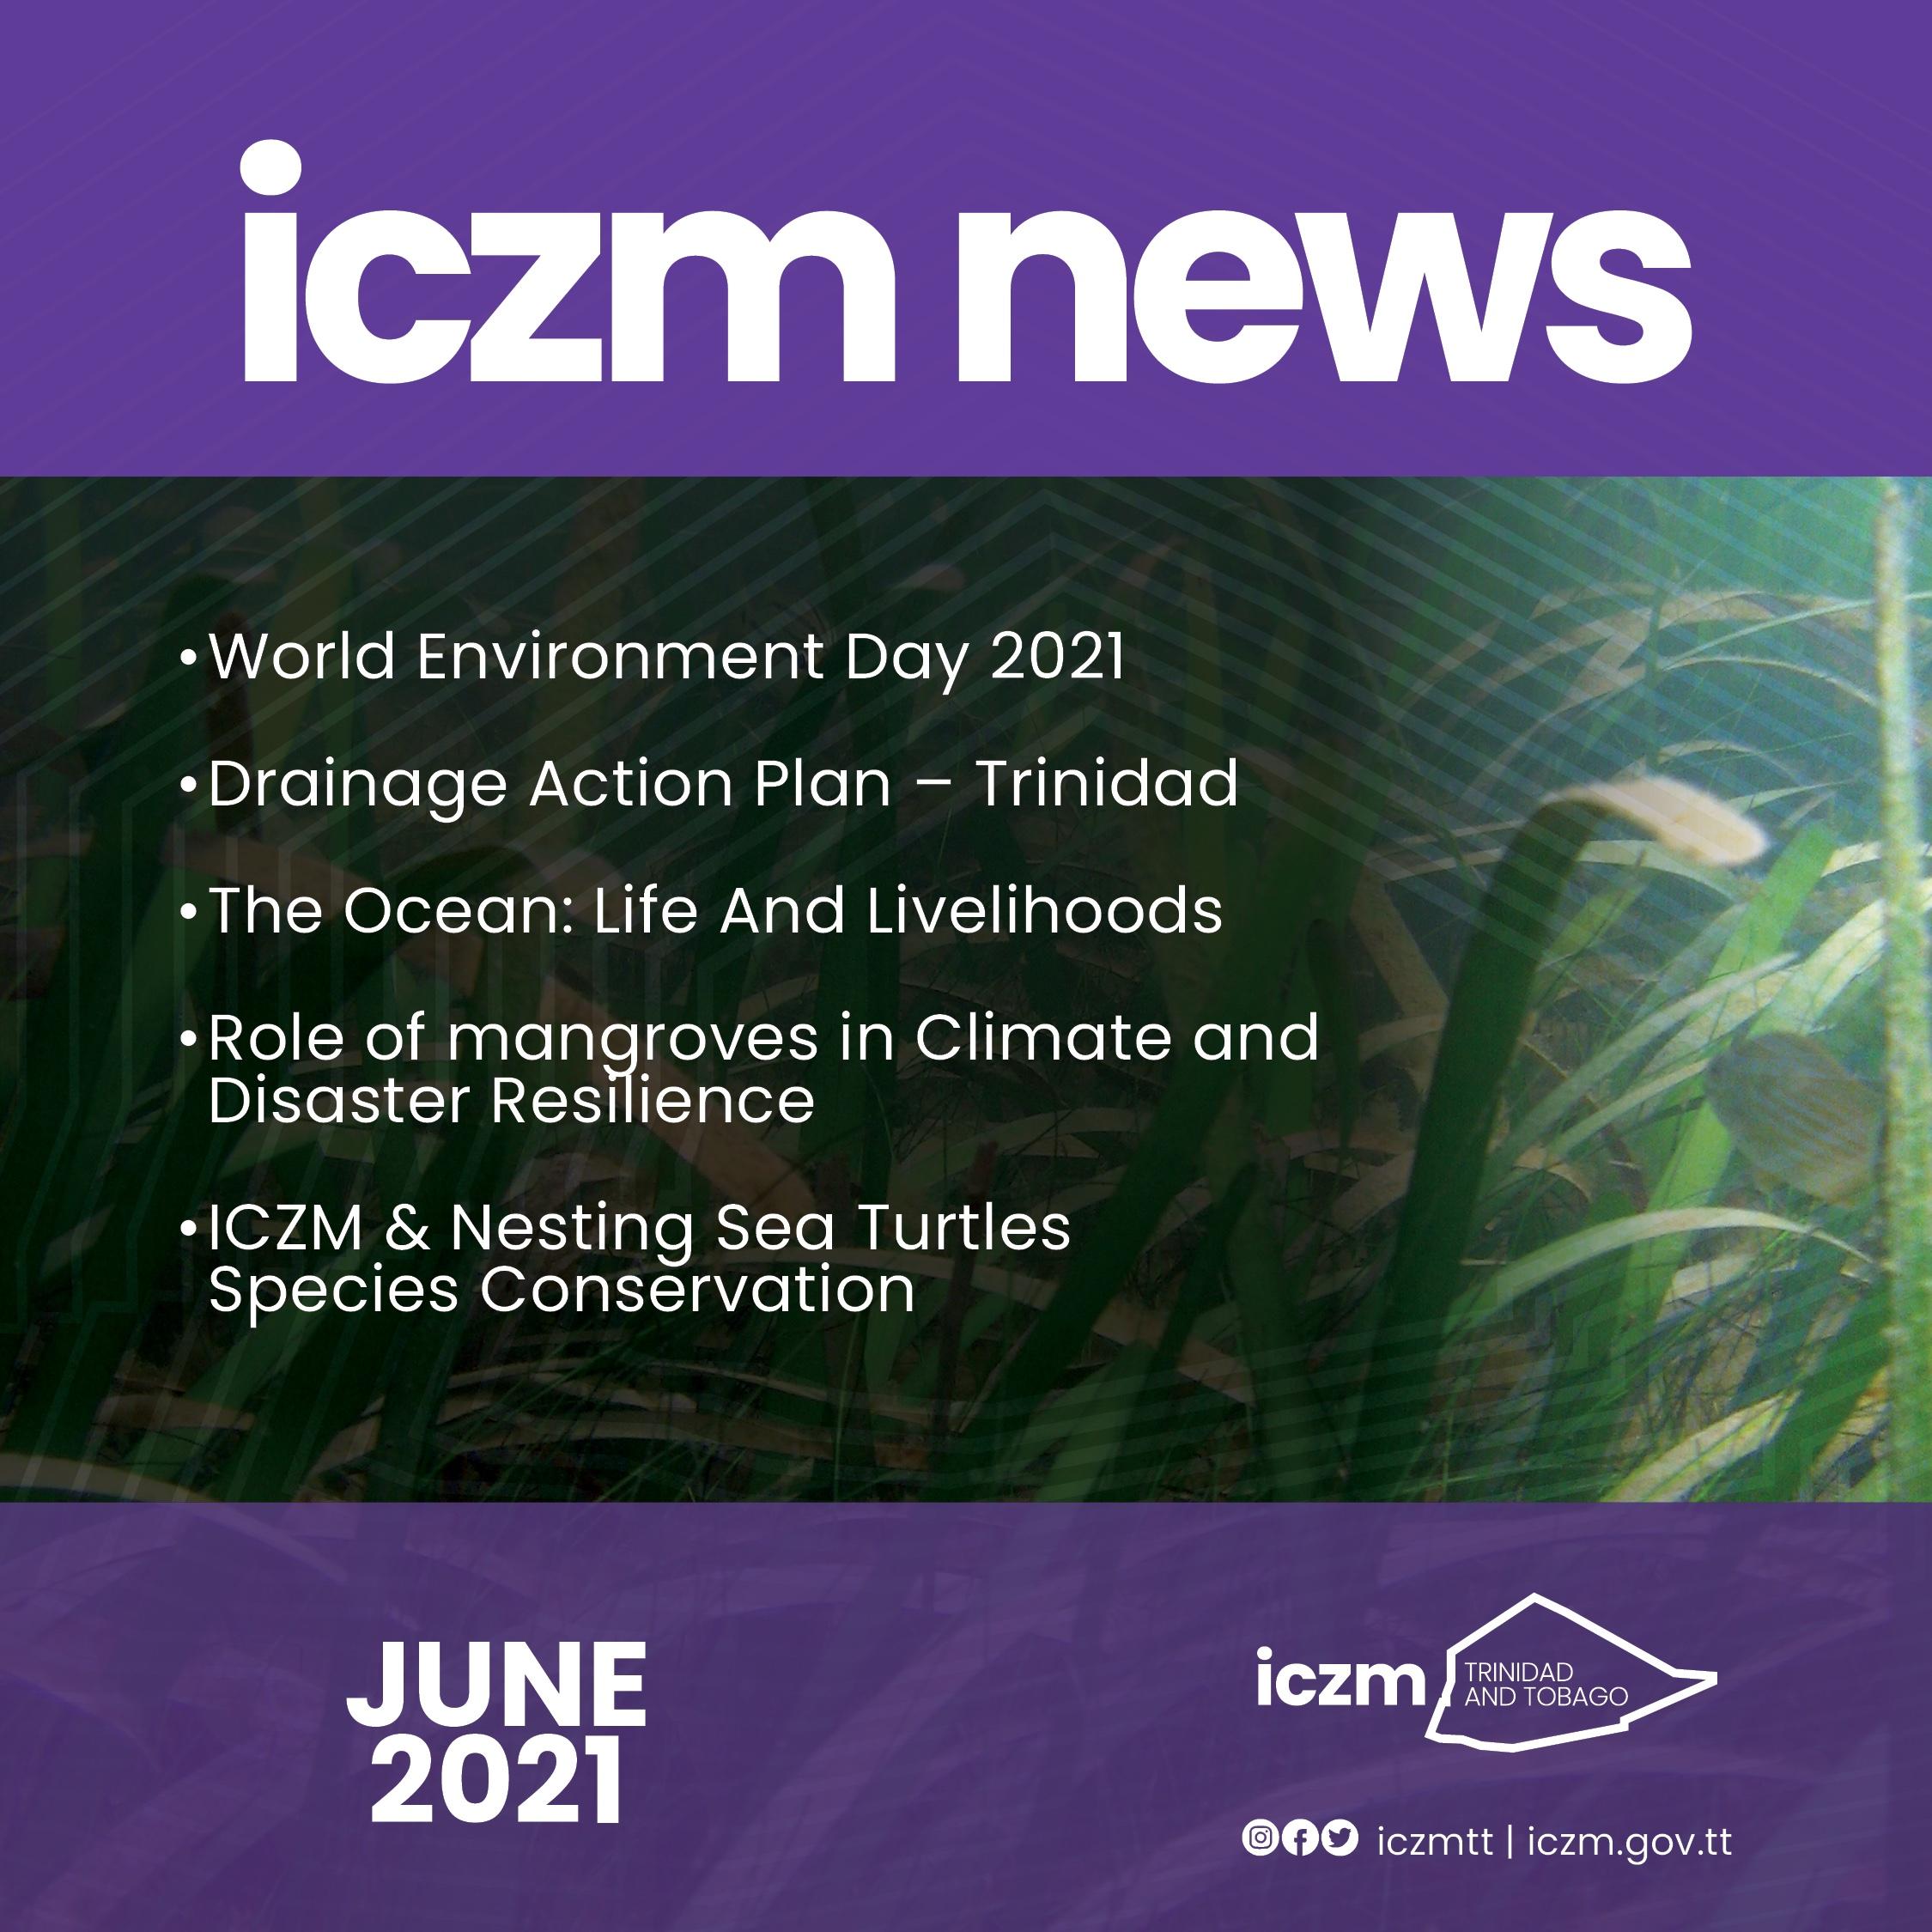 ICZM NEWS – June 2021